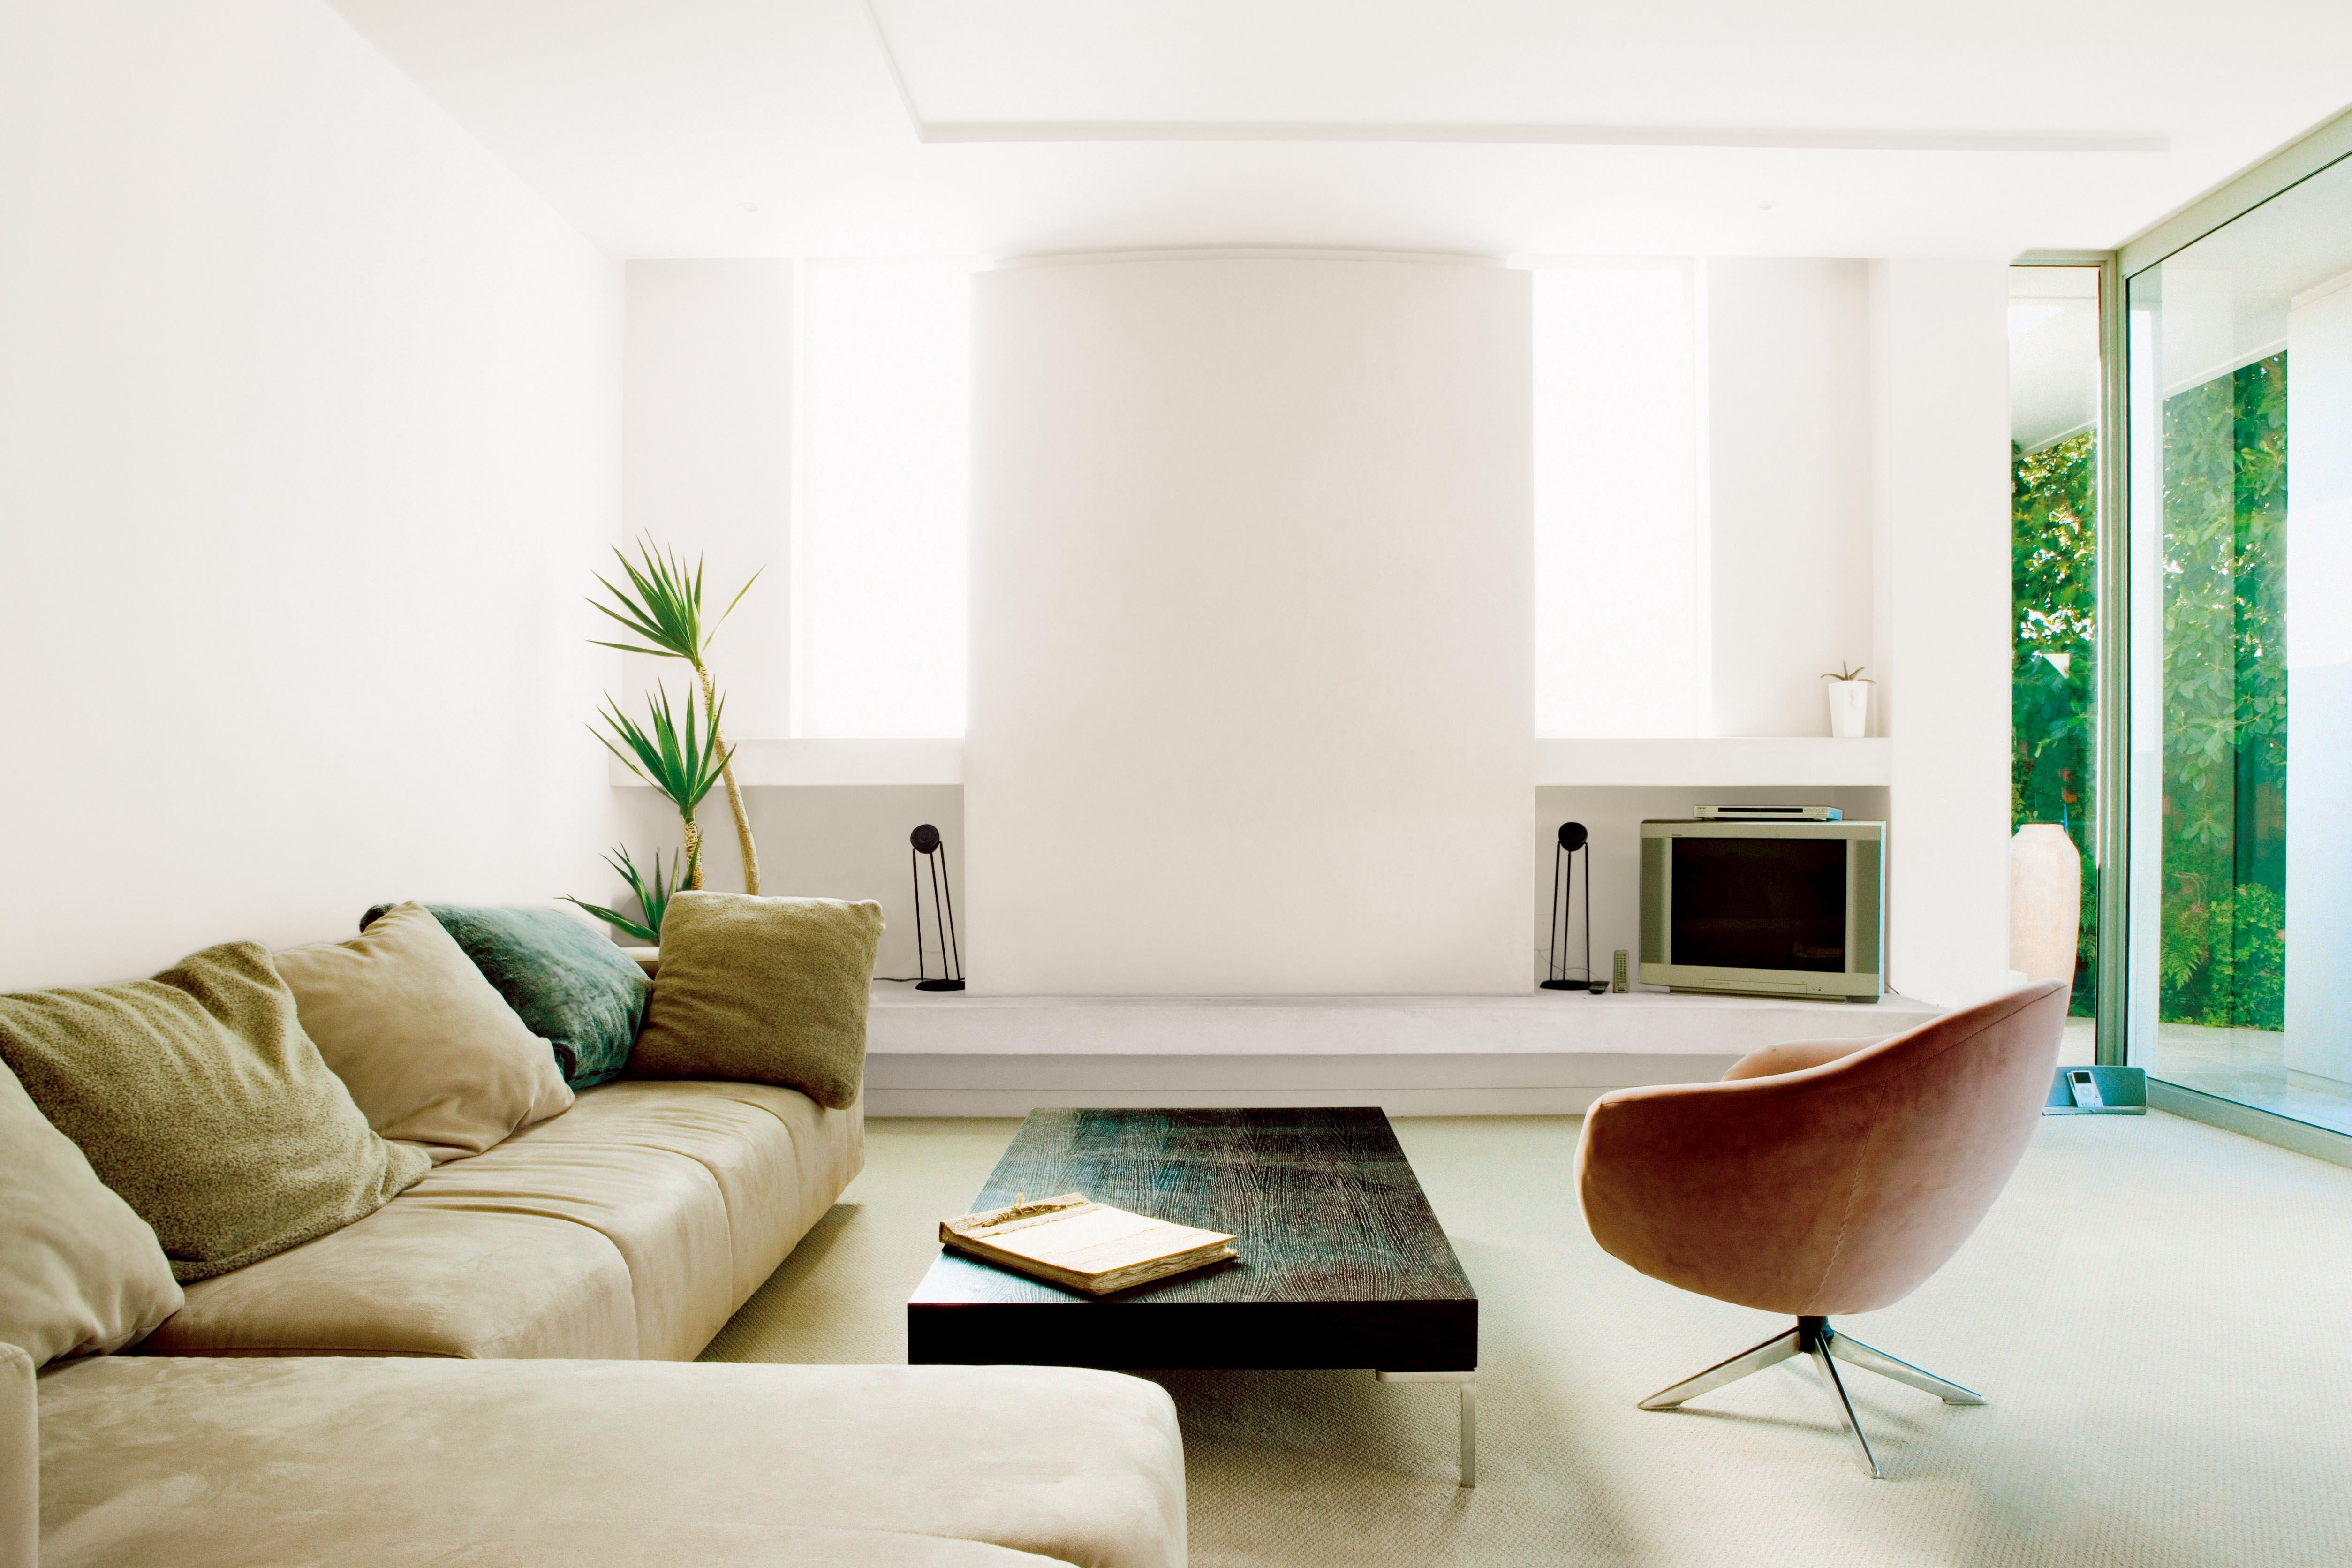 5015x3343 > Room Wallpapers